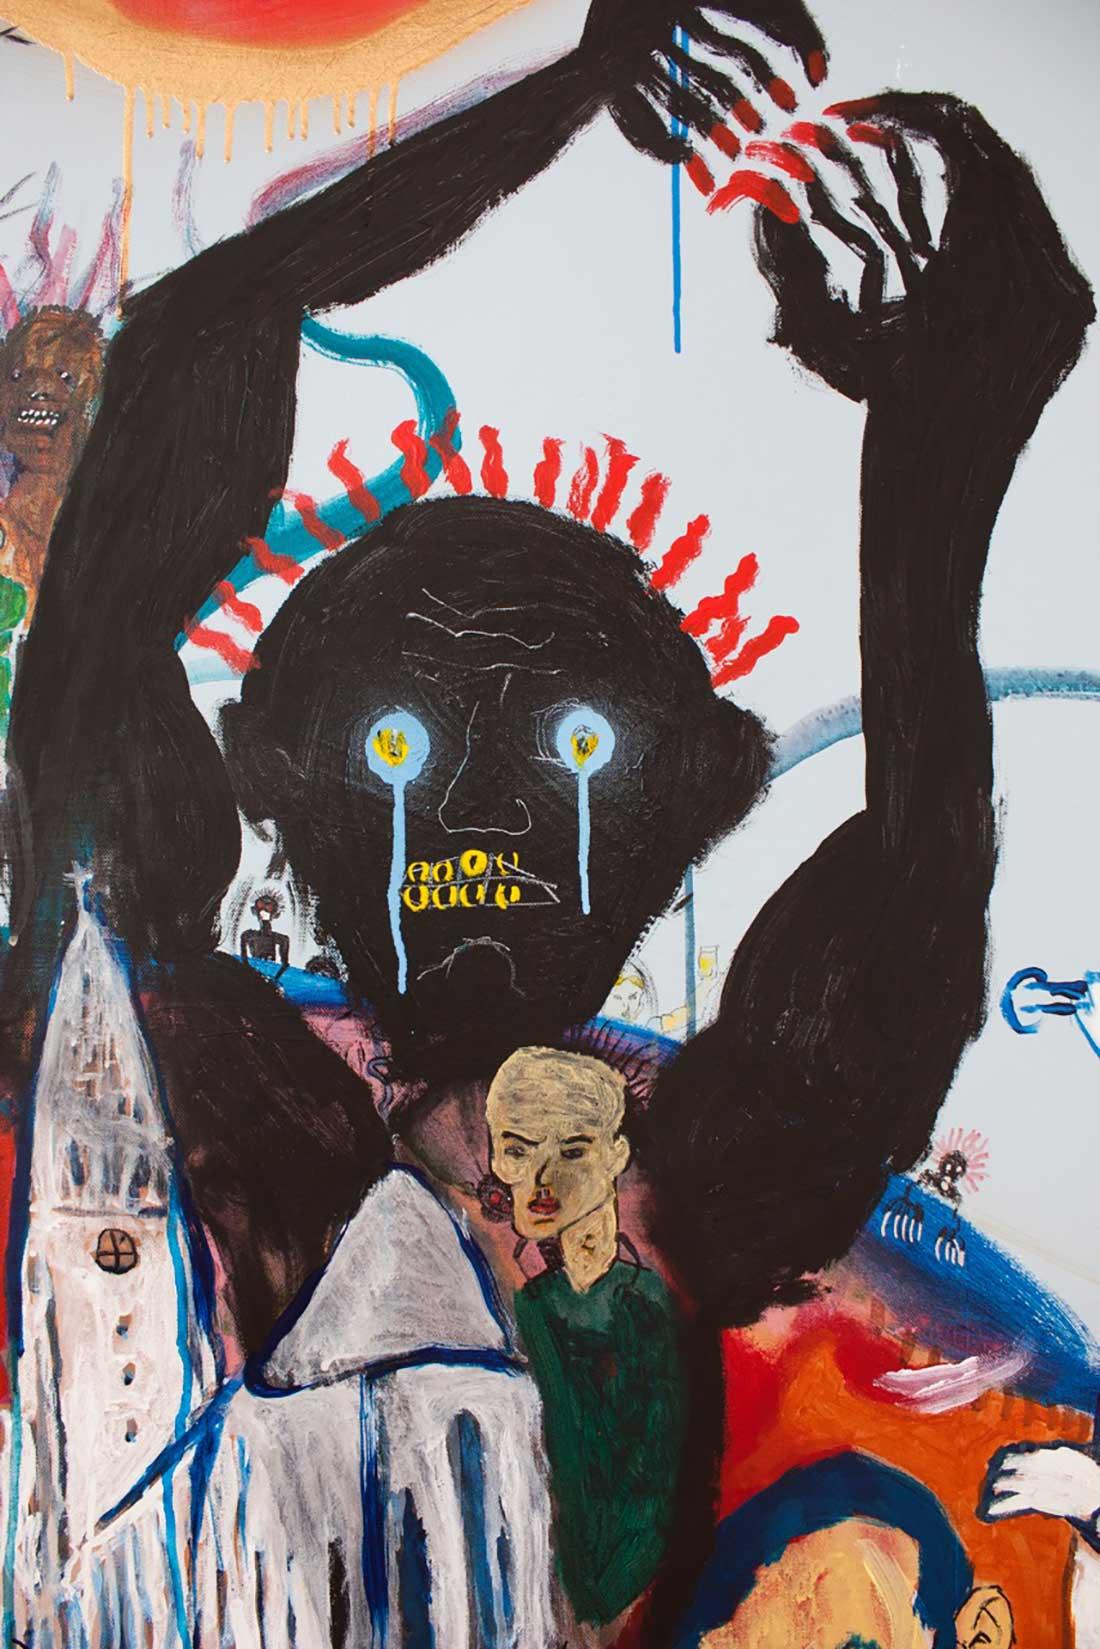 Úlfur Karlsson Artist - We are not afraid (detail)